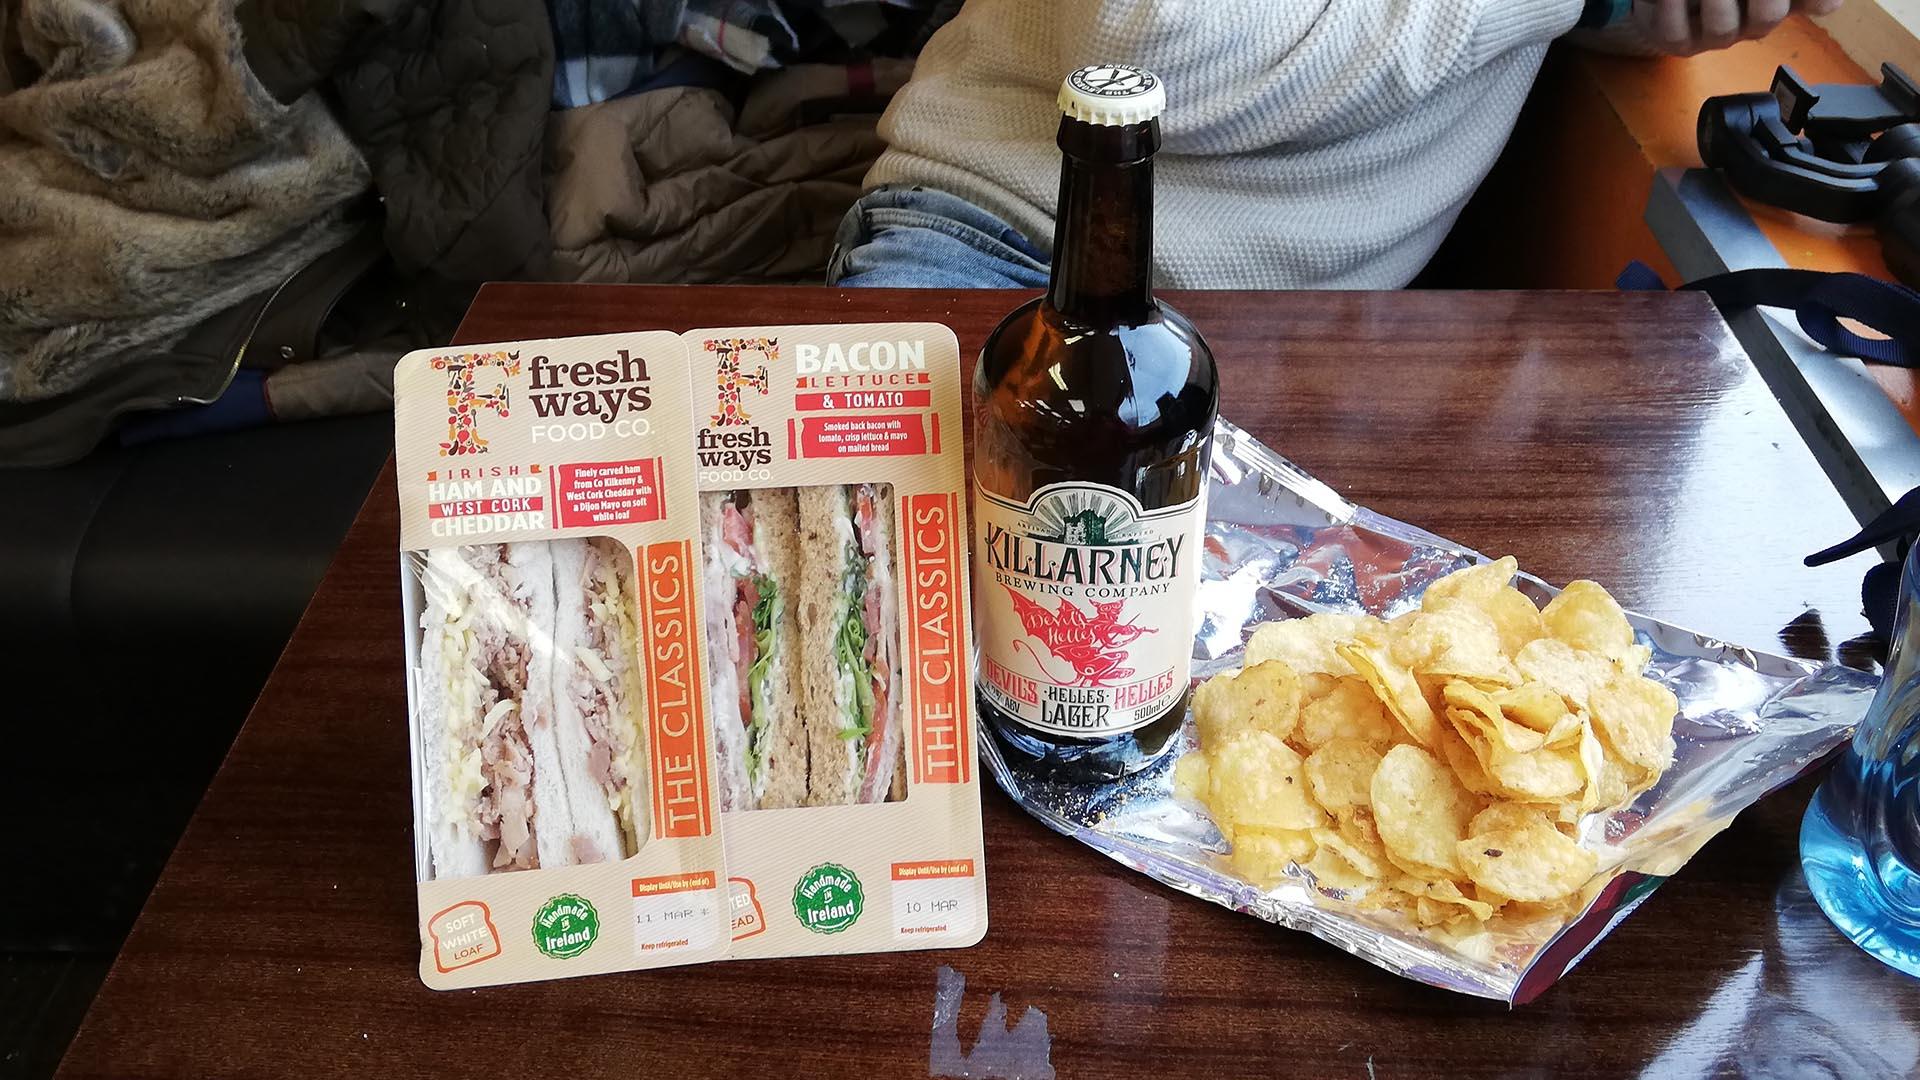 Comida rápida antes de la visita a la Guinness Storehouse, Dublín, Irlanda